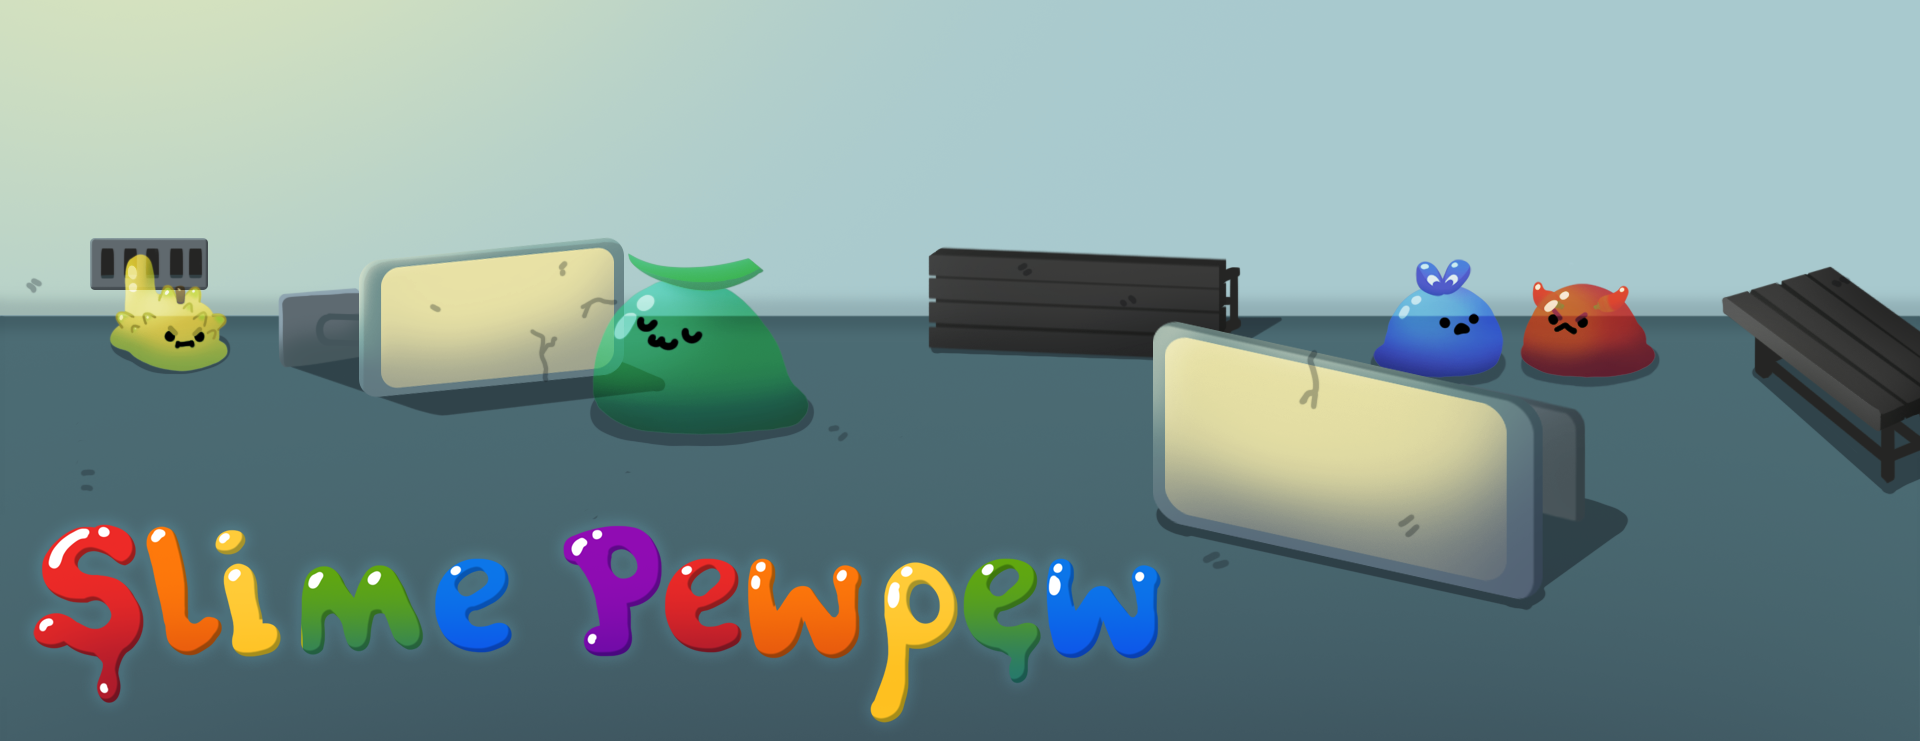 Slime Pewpew